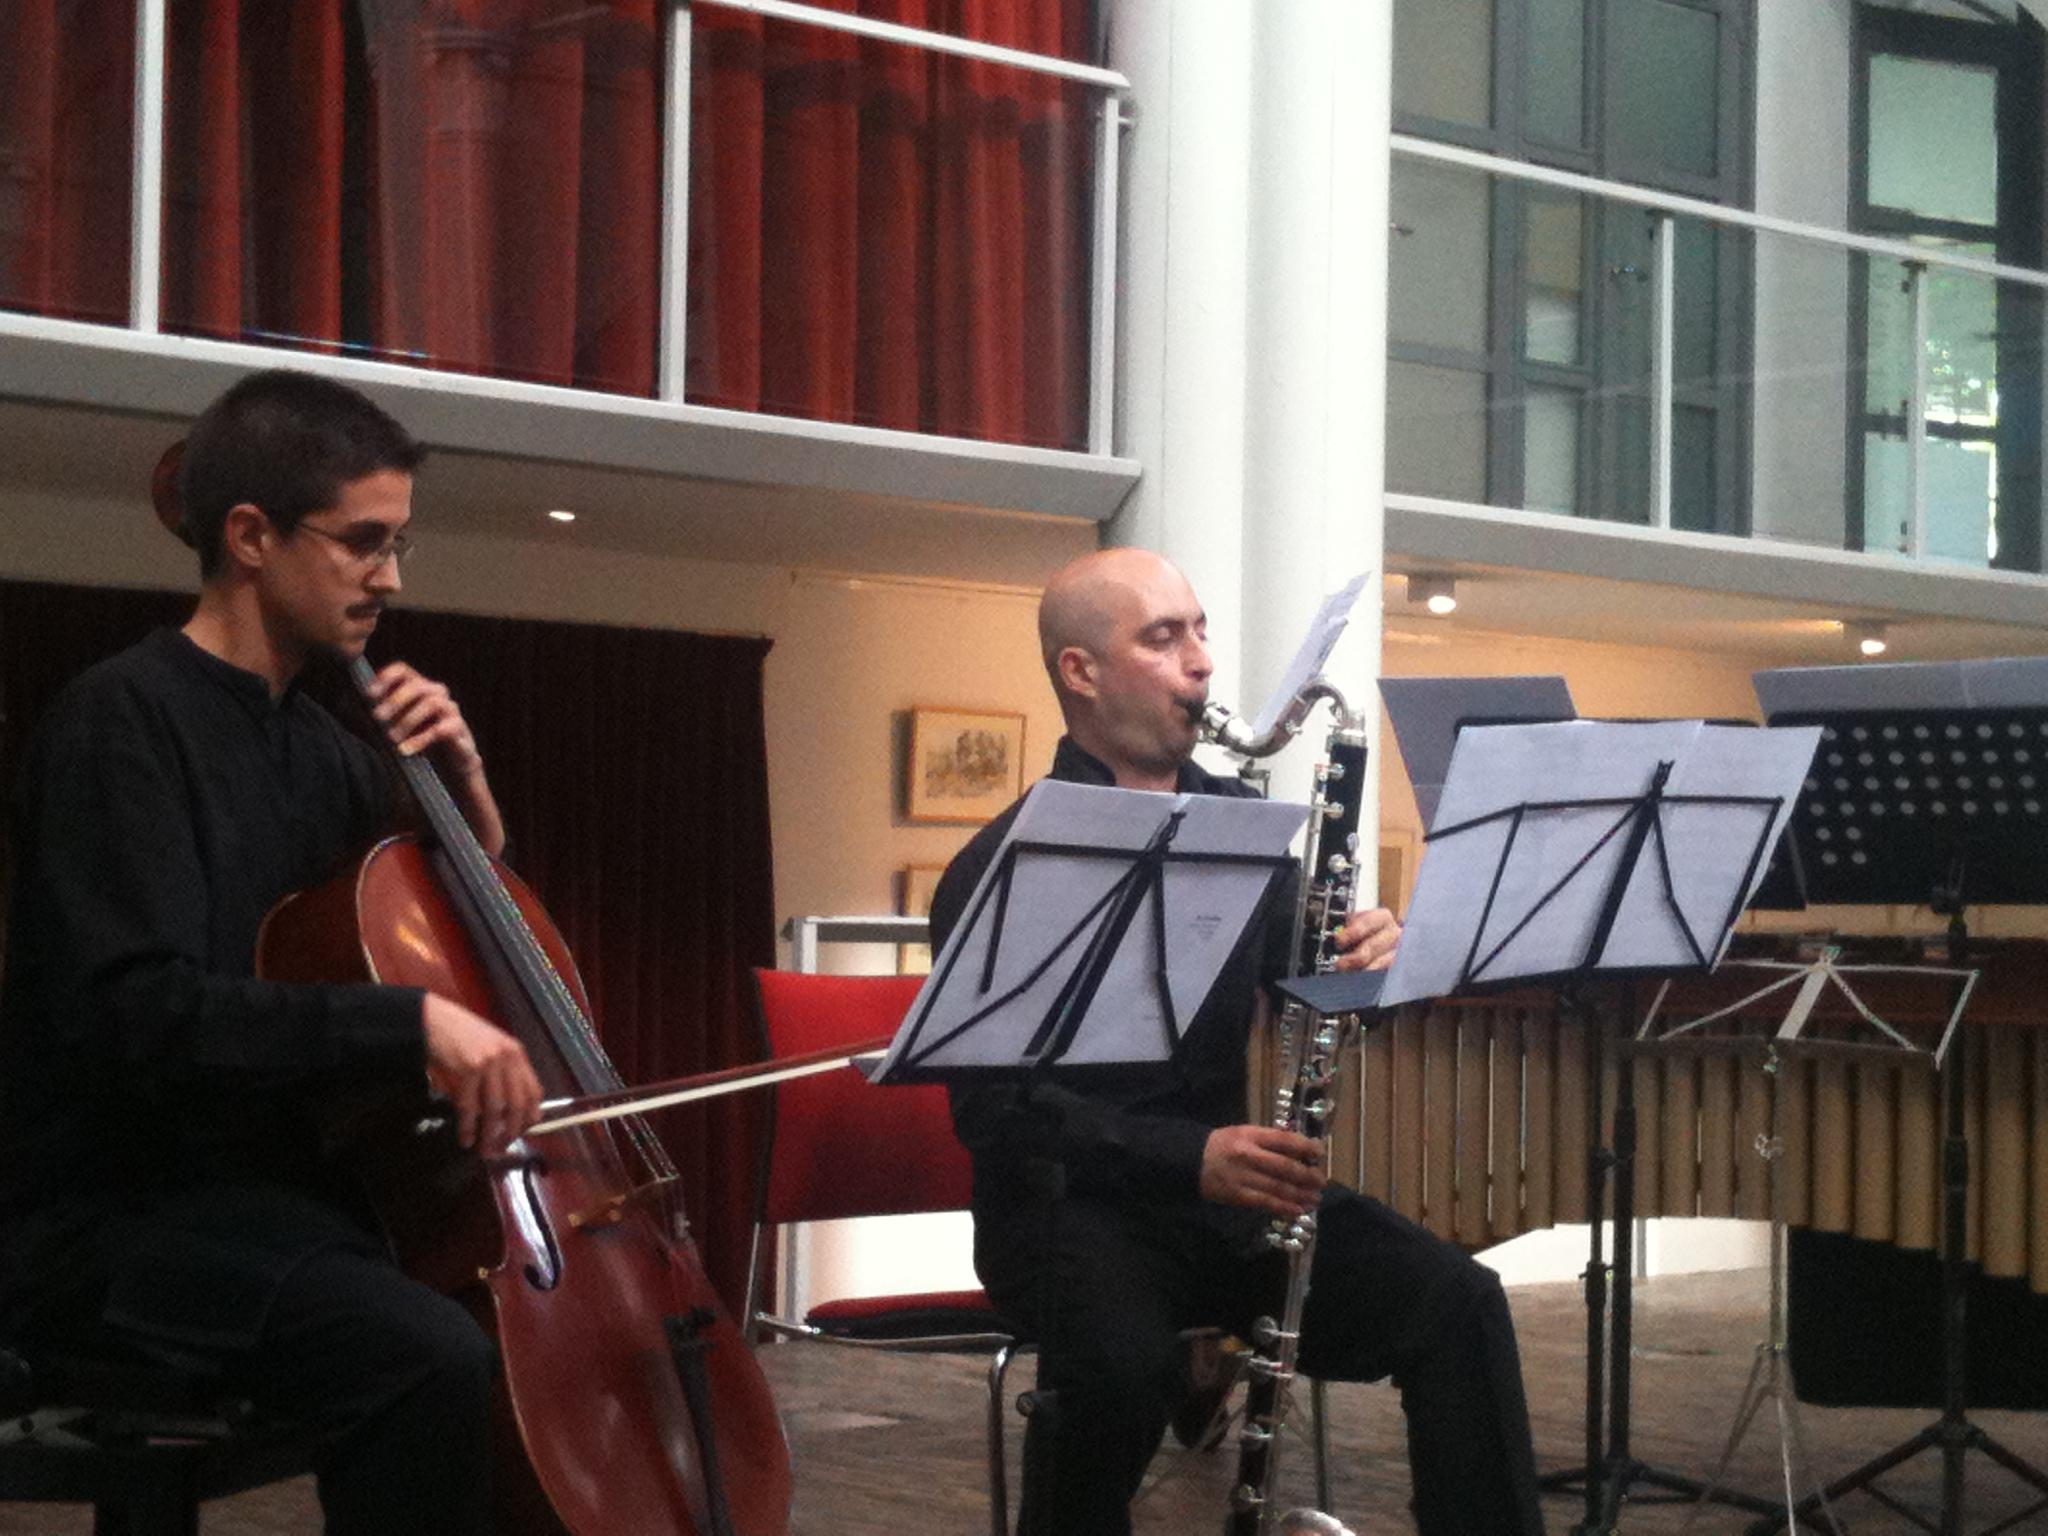 Enrique-Mendoza-La-Sombra-Amstelkerk-Avlitria-Ensemble-Amsterdam